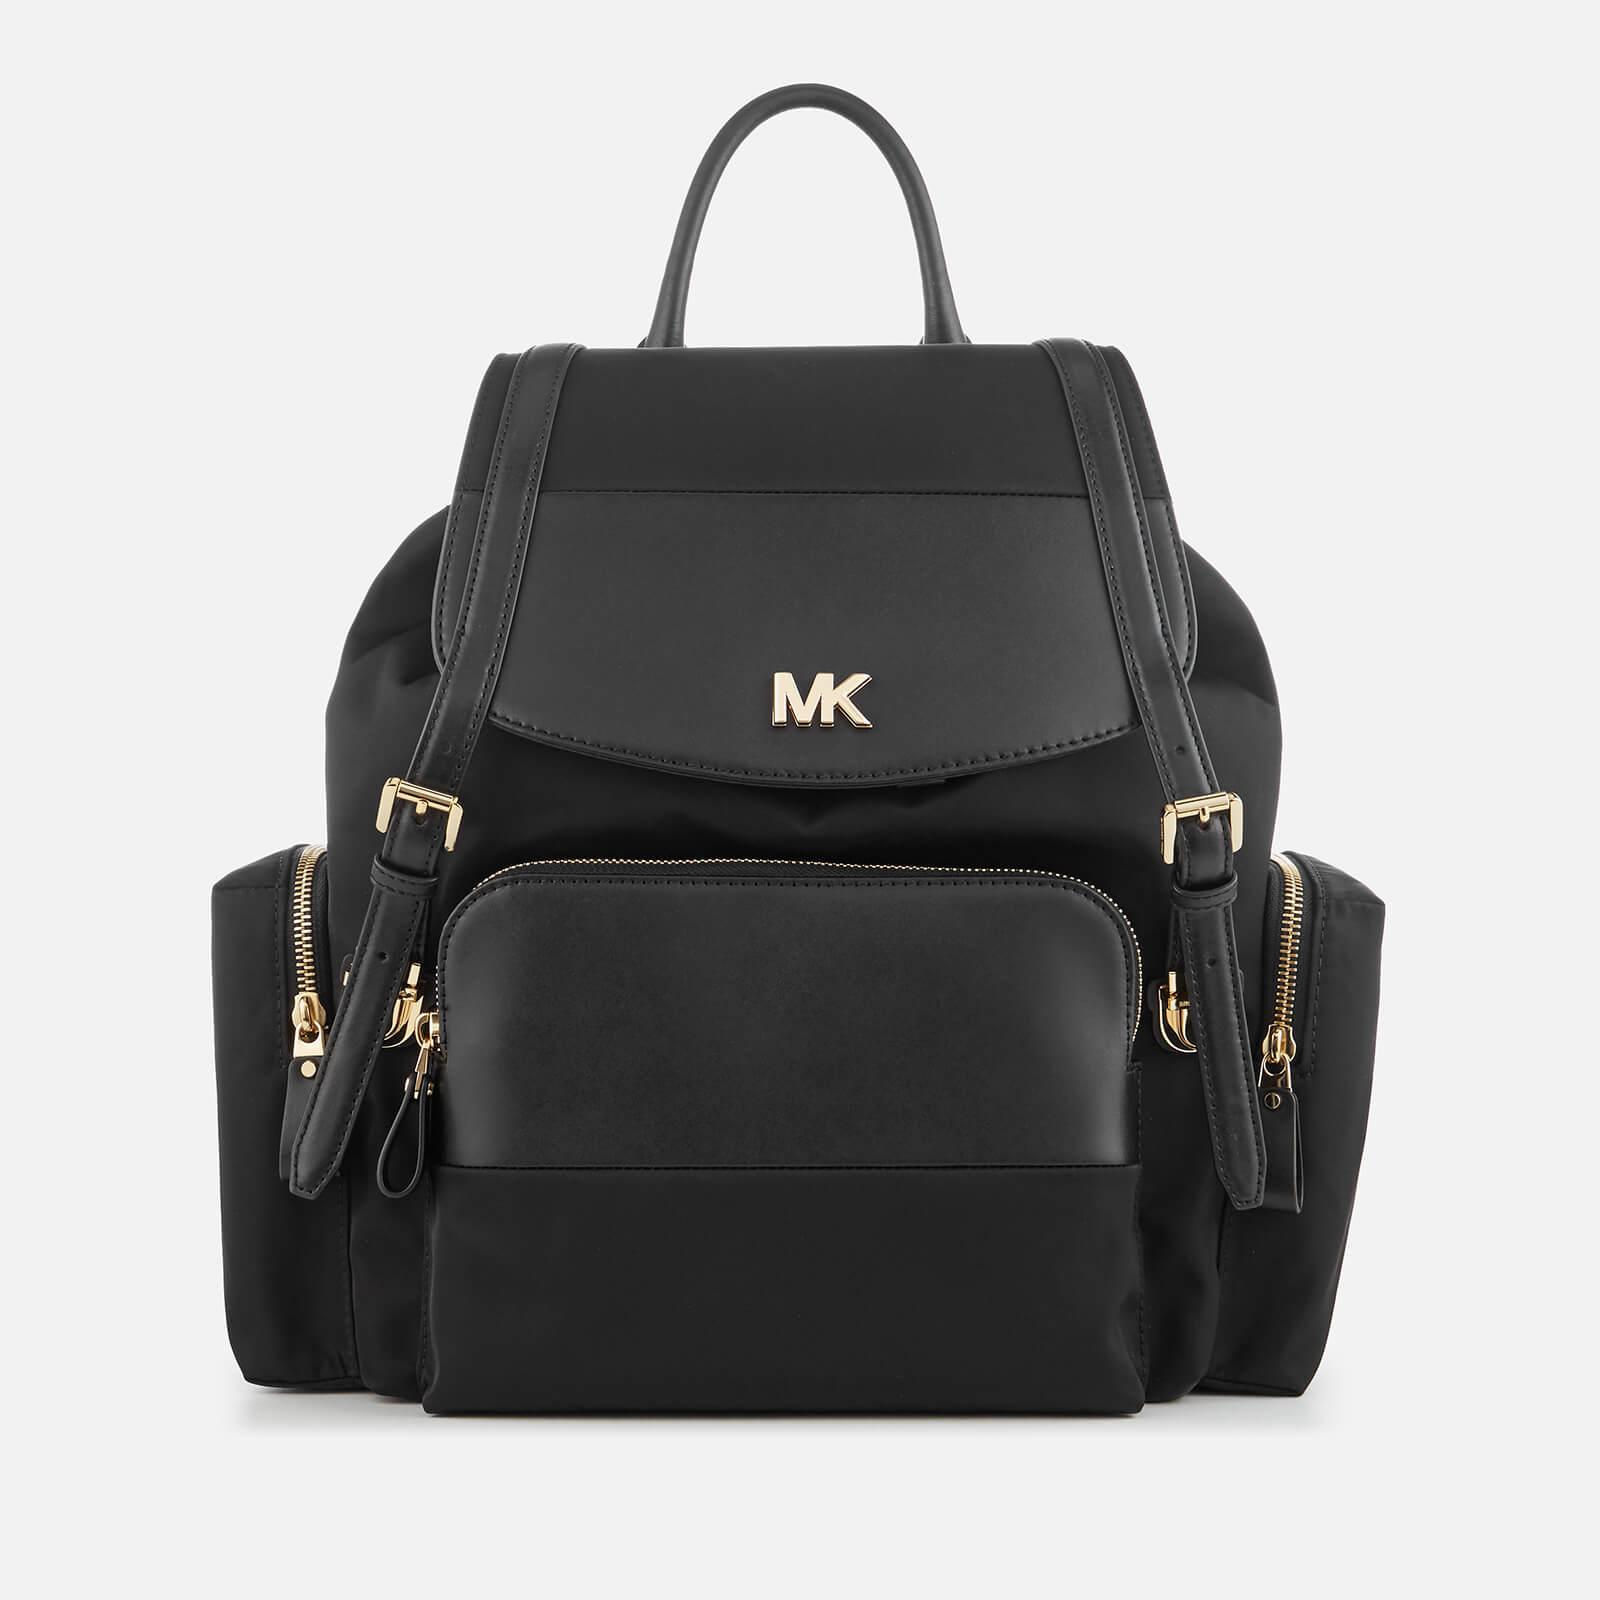 35db37cbd87df7 MICHAEL MICHAEL KORS Women's Mott Changing Bag Backpack - Black - Free UK  Delivery over £50